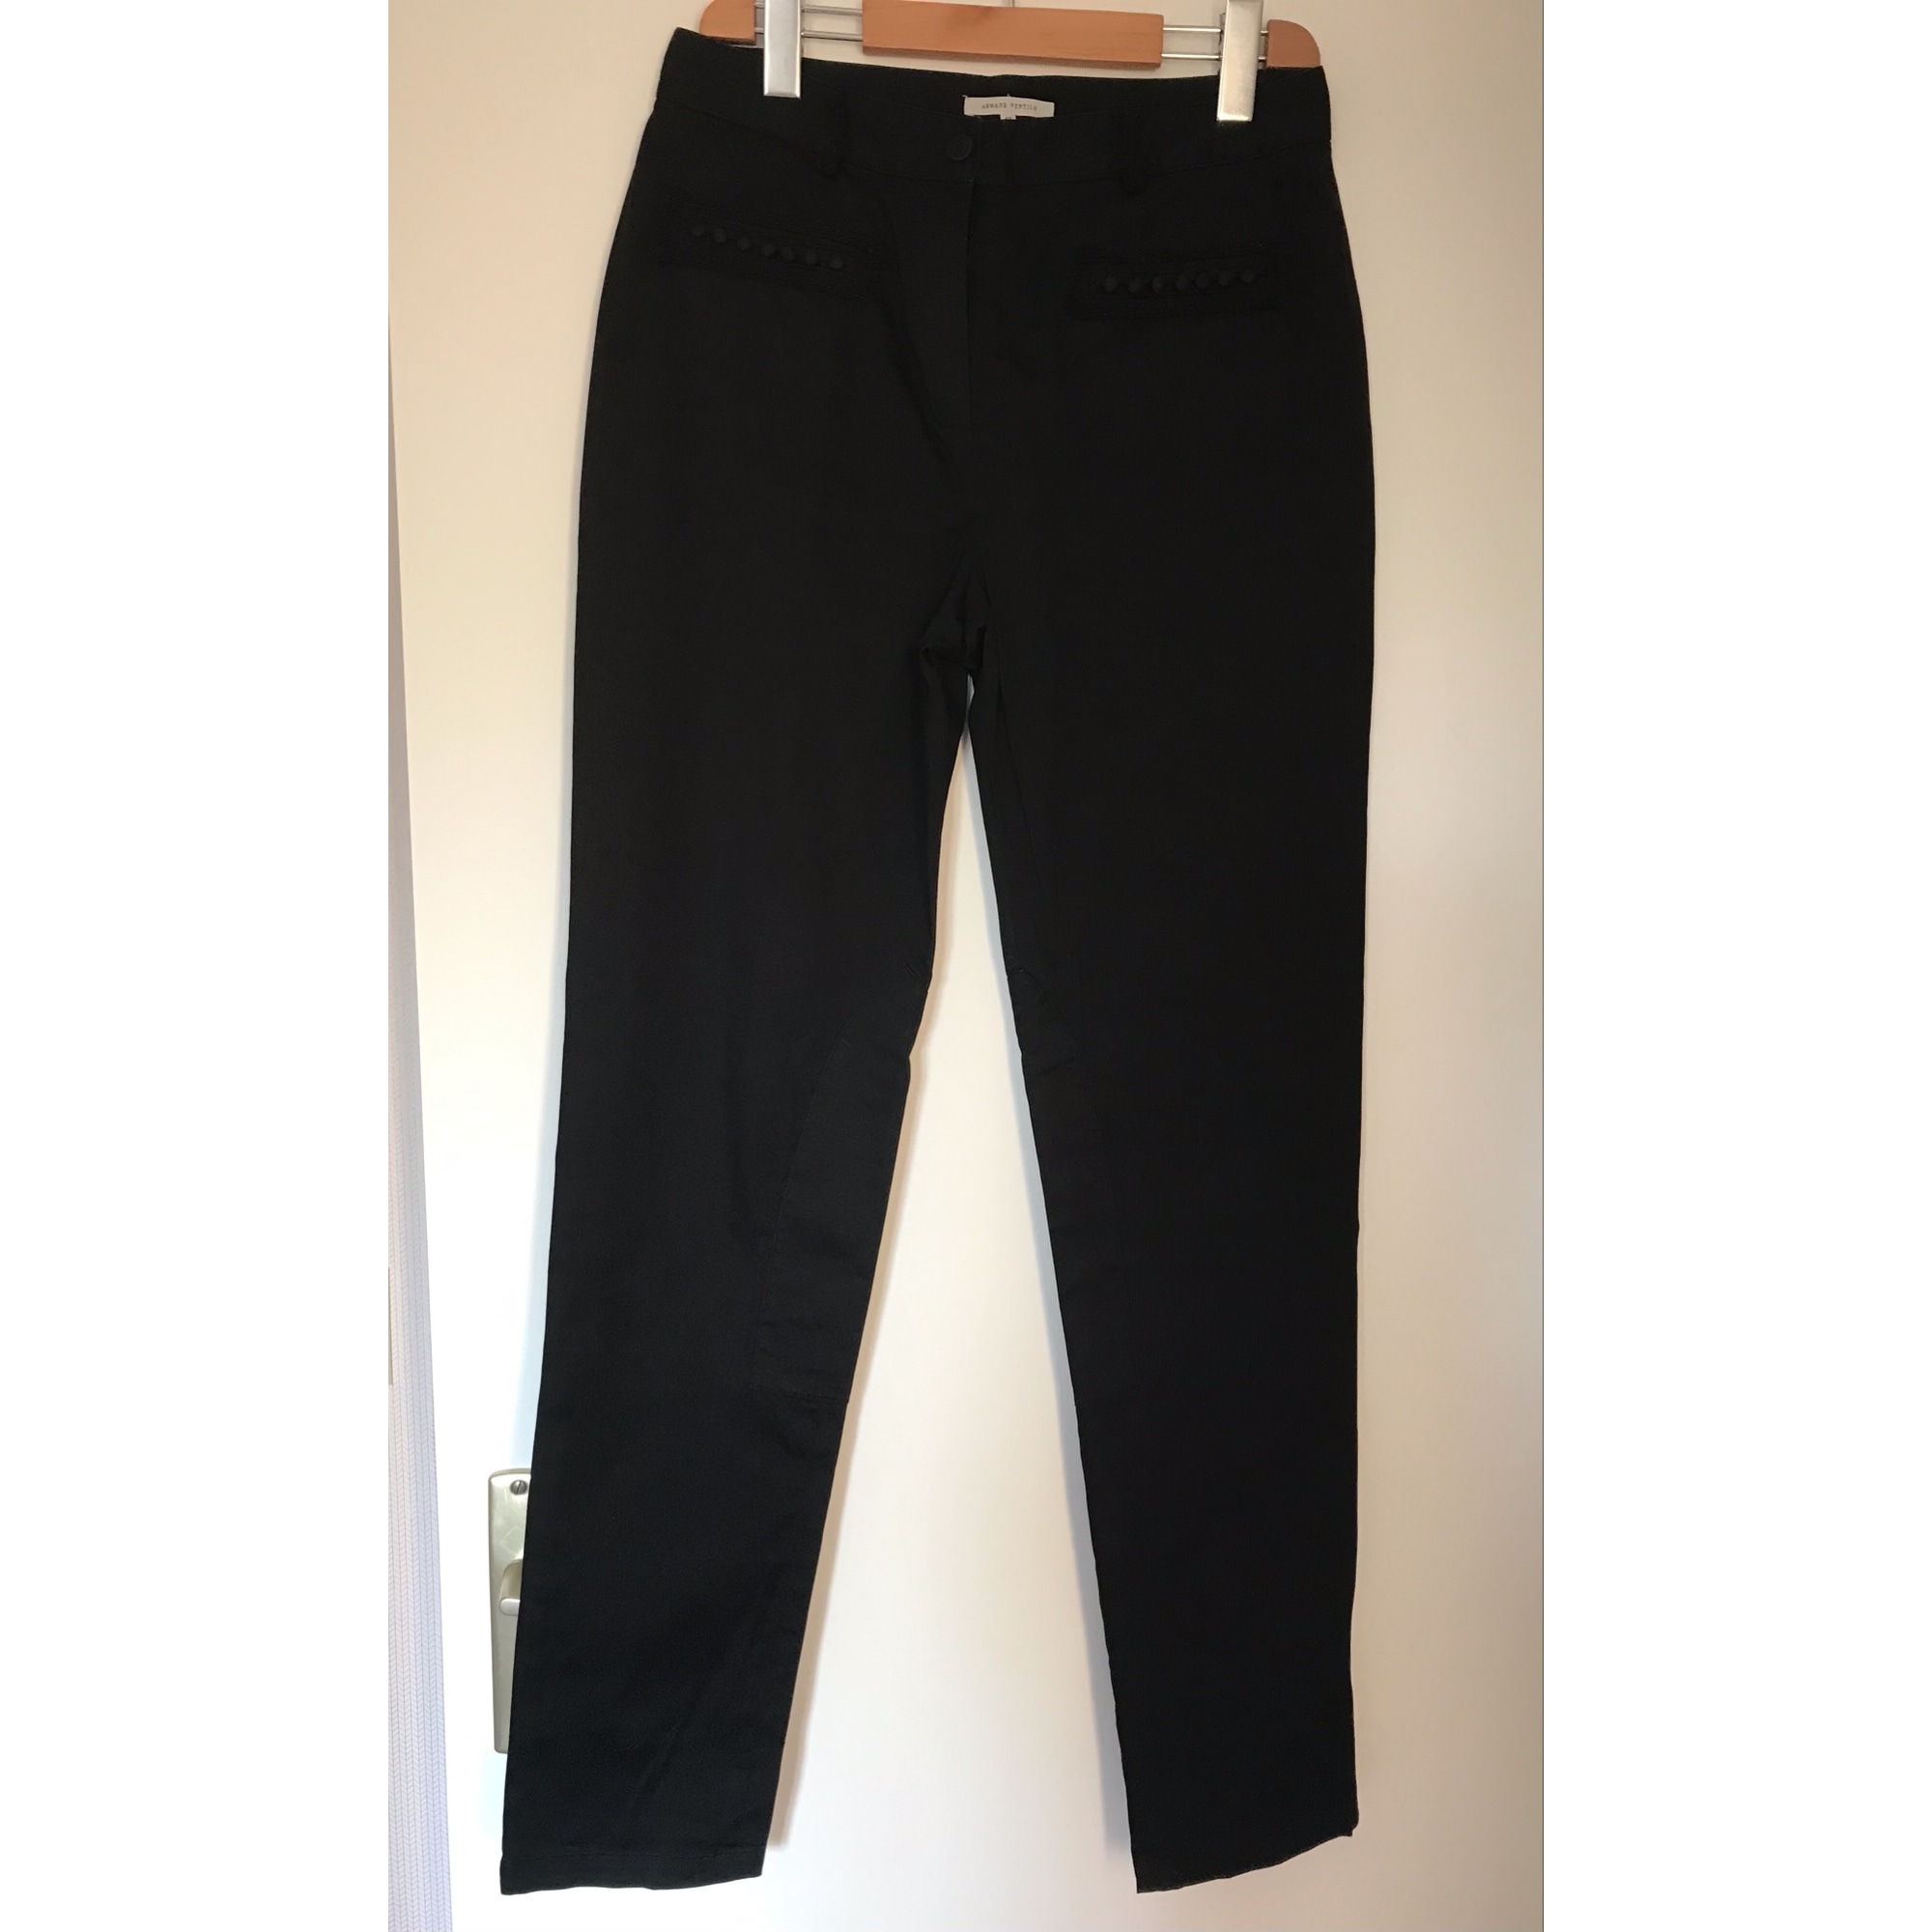 Pantalon slim, cigarette ARMAND VENTILO Noir